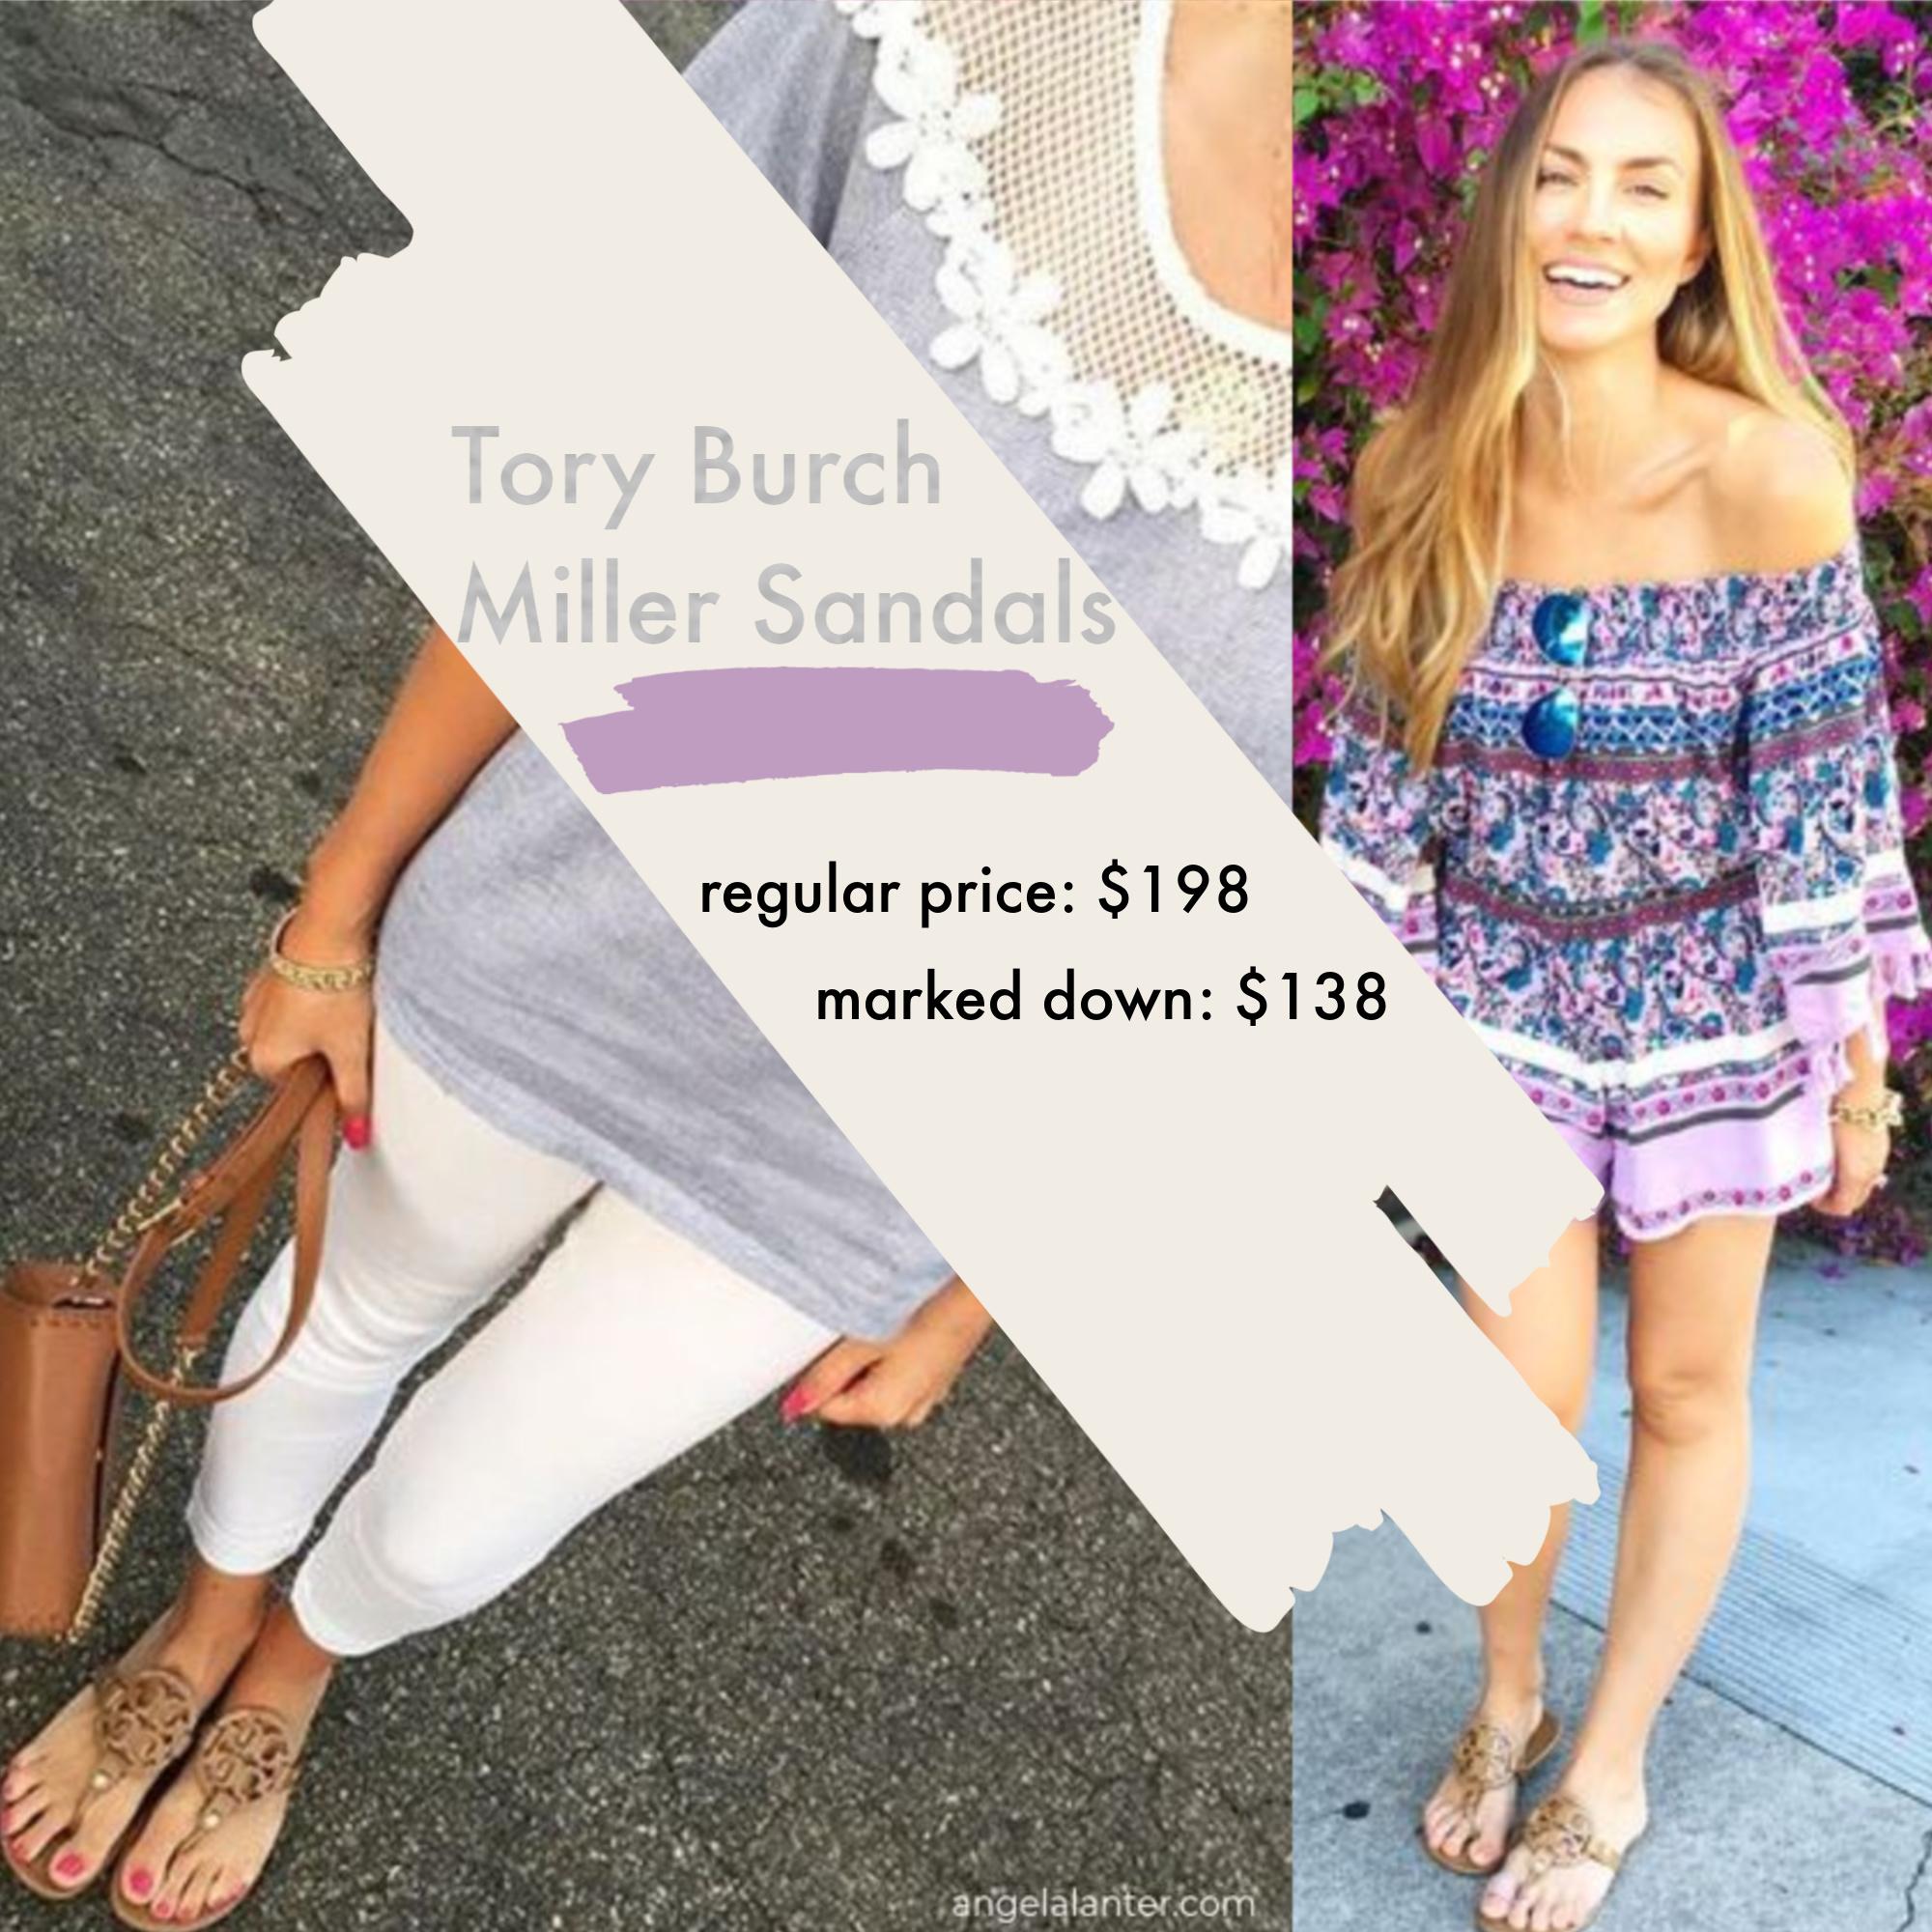 Cyber Monday sales angela lanter hello gorgeous